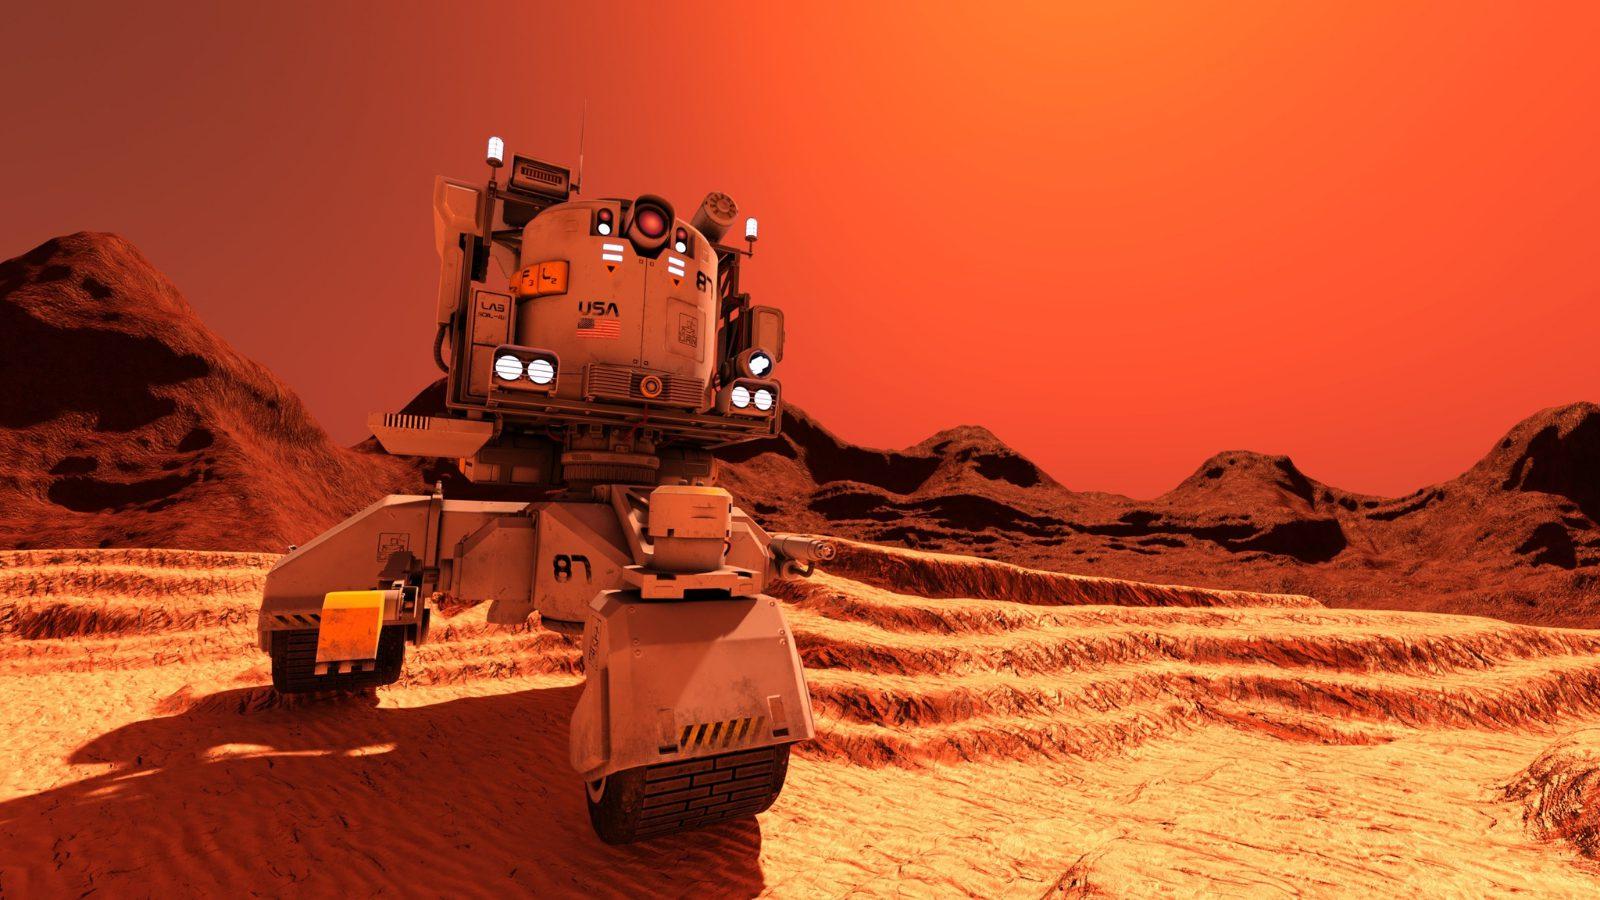 NASA、火星の物体をAIで分類。3年間の成果を発表【AI×社会】(論文解説)